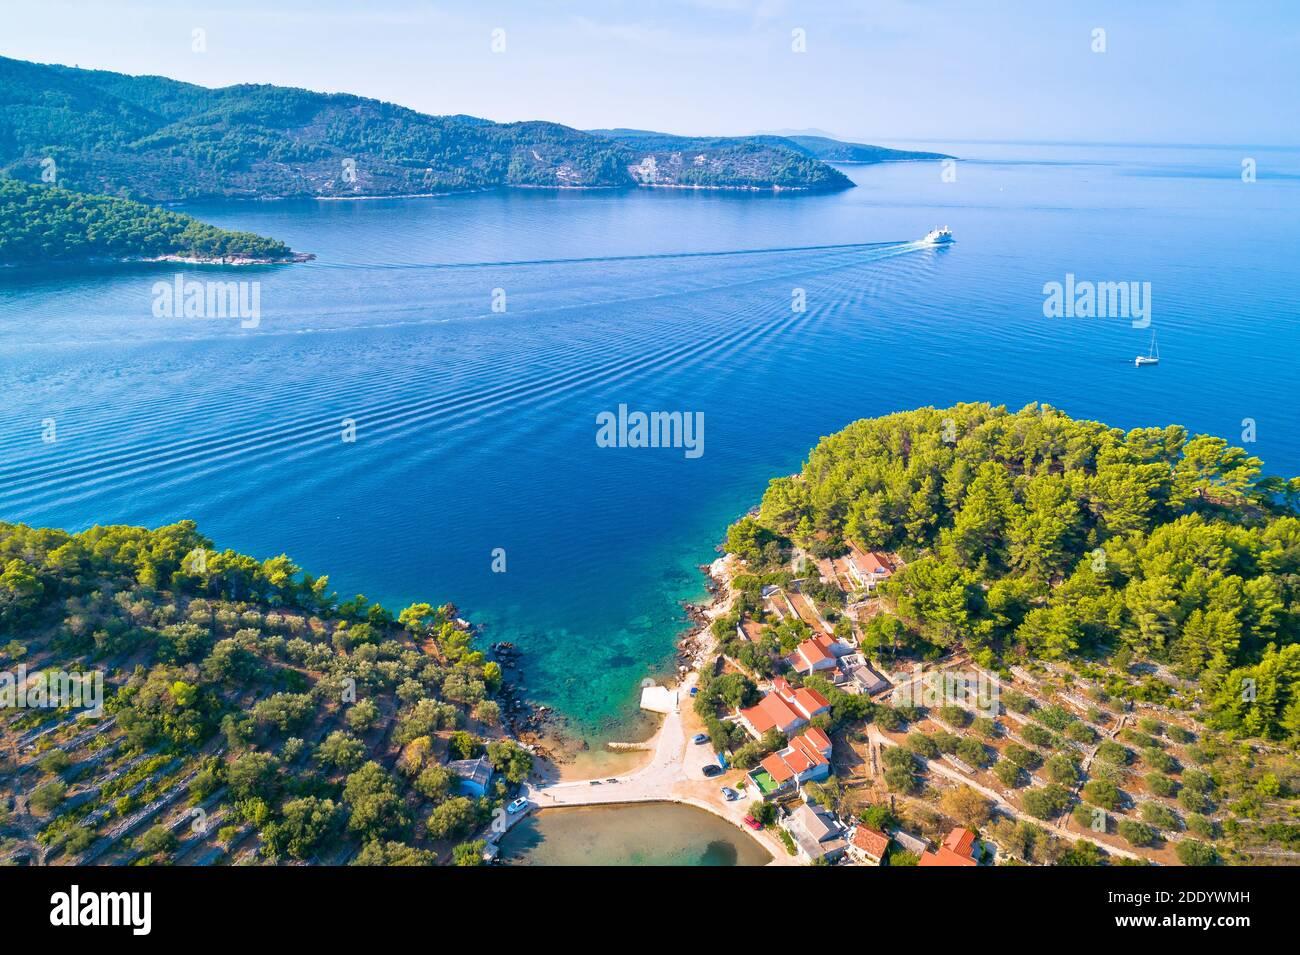 Korcula island. Bay entrance of Vela Luka aerial view, archipelago of southern Dalmatia, Croatia Stock Photo